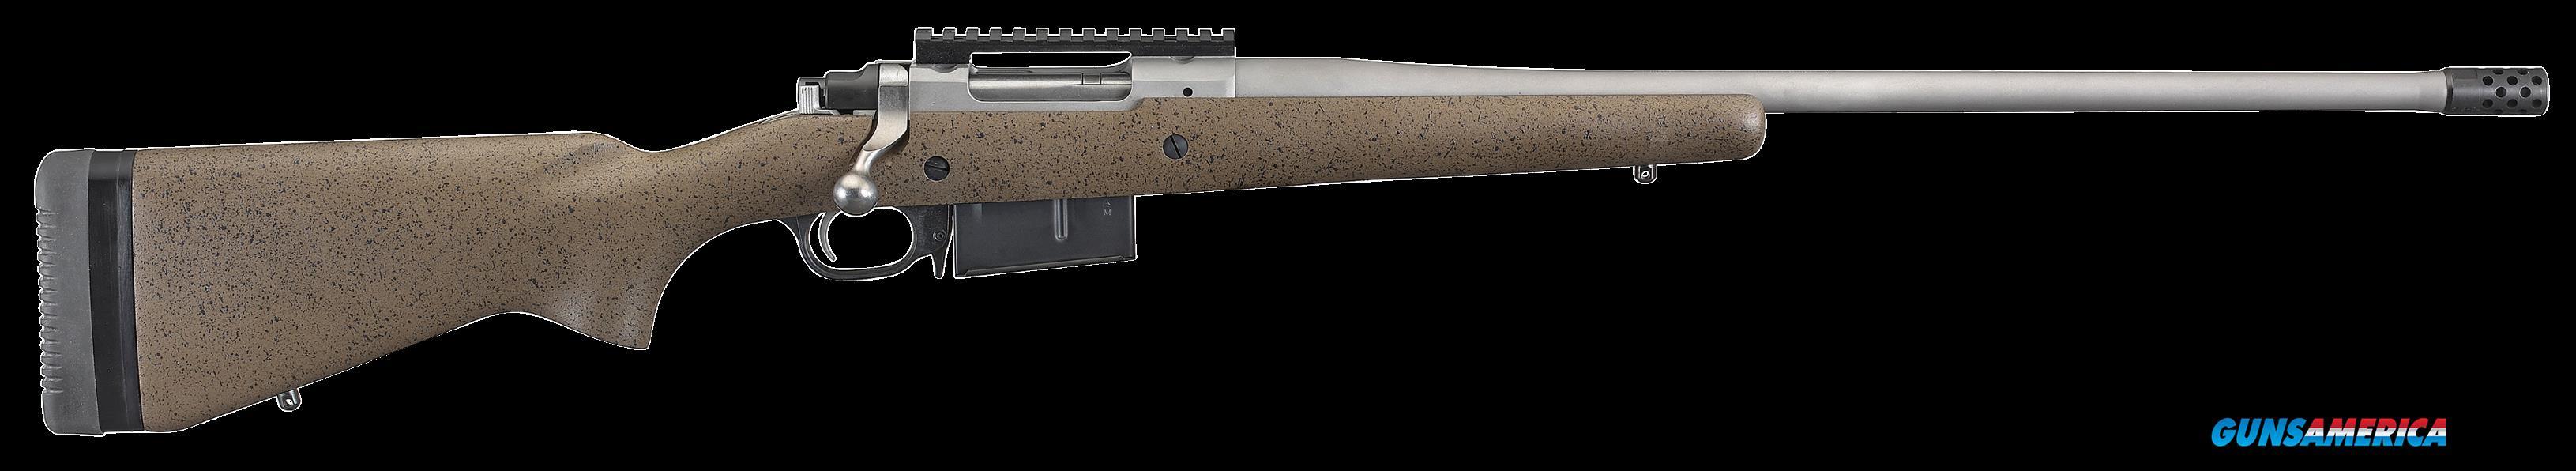 Ruger Hawkeye, Rug 47198 Hawkeye Lr Hnt   6.5crd 22 Blk-br Lam 3r  Guns > Pistols > 1911 Pistol Copies (non-Colt)